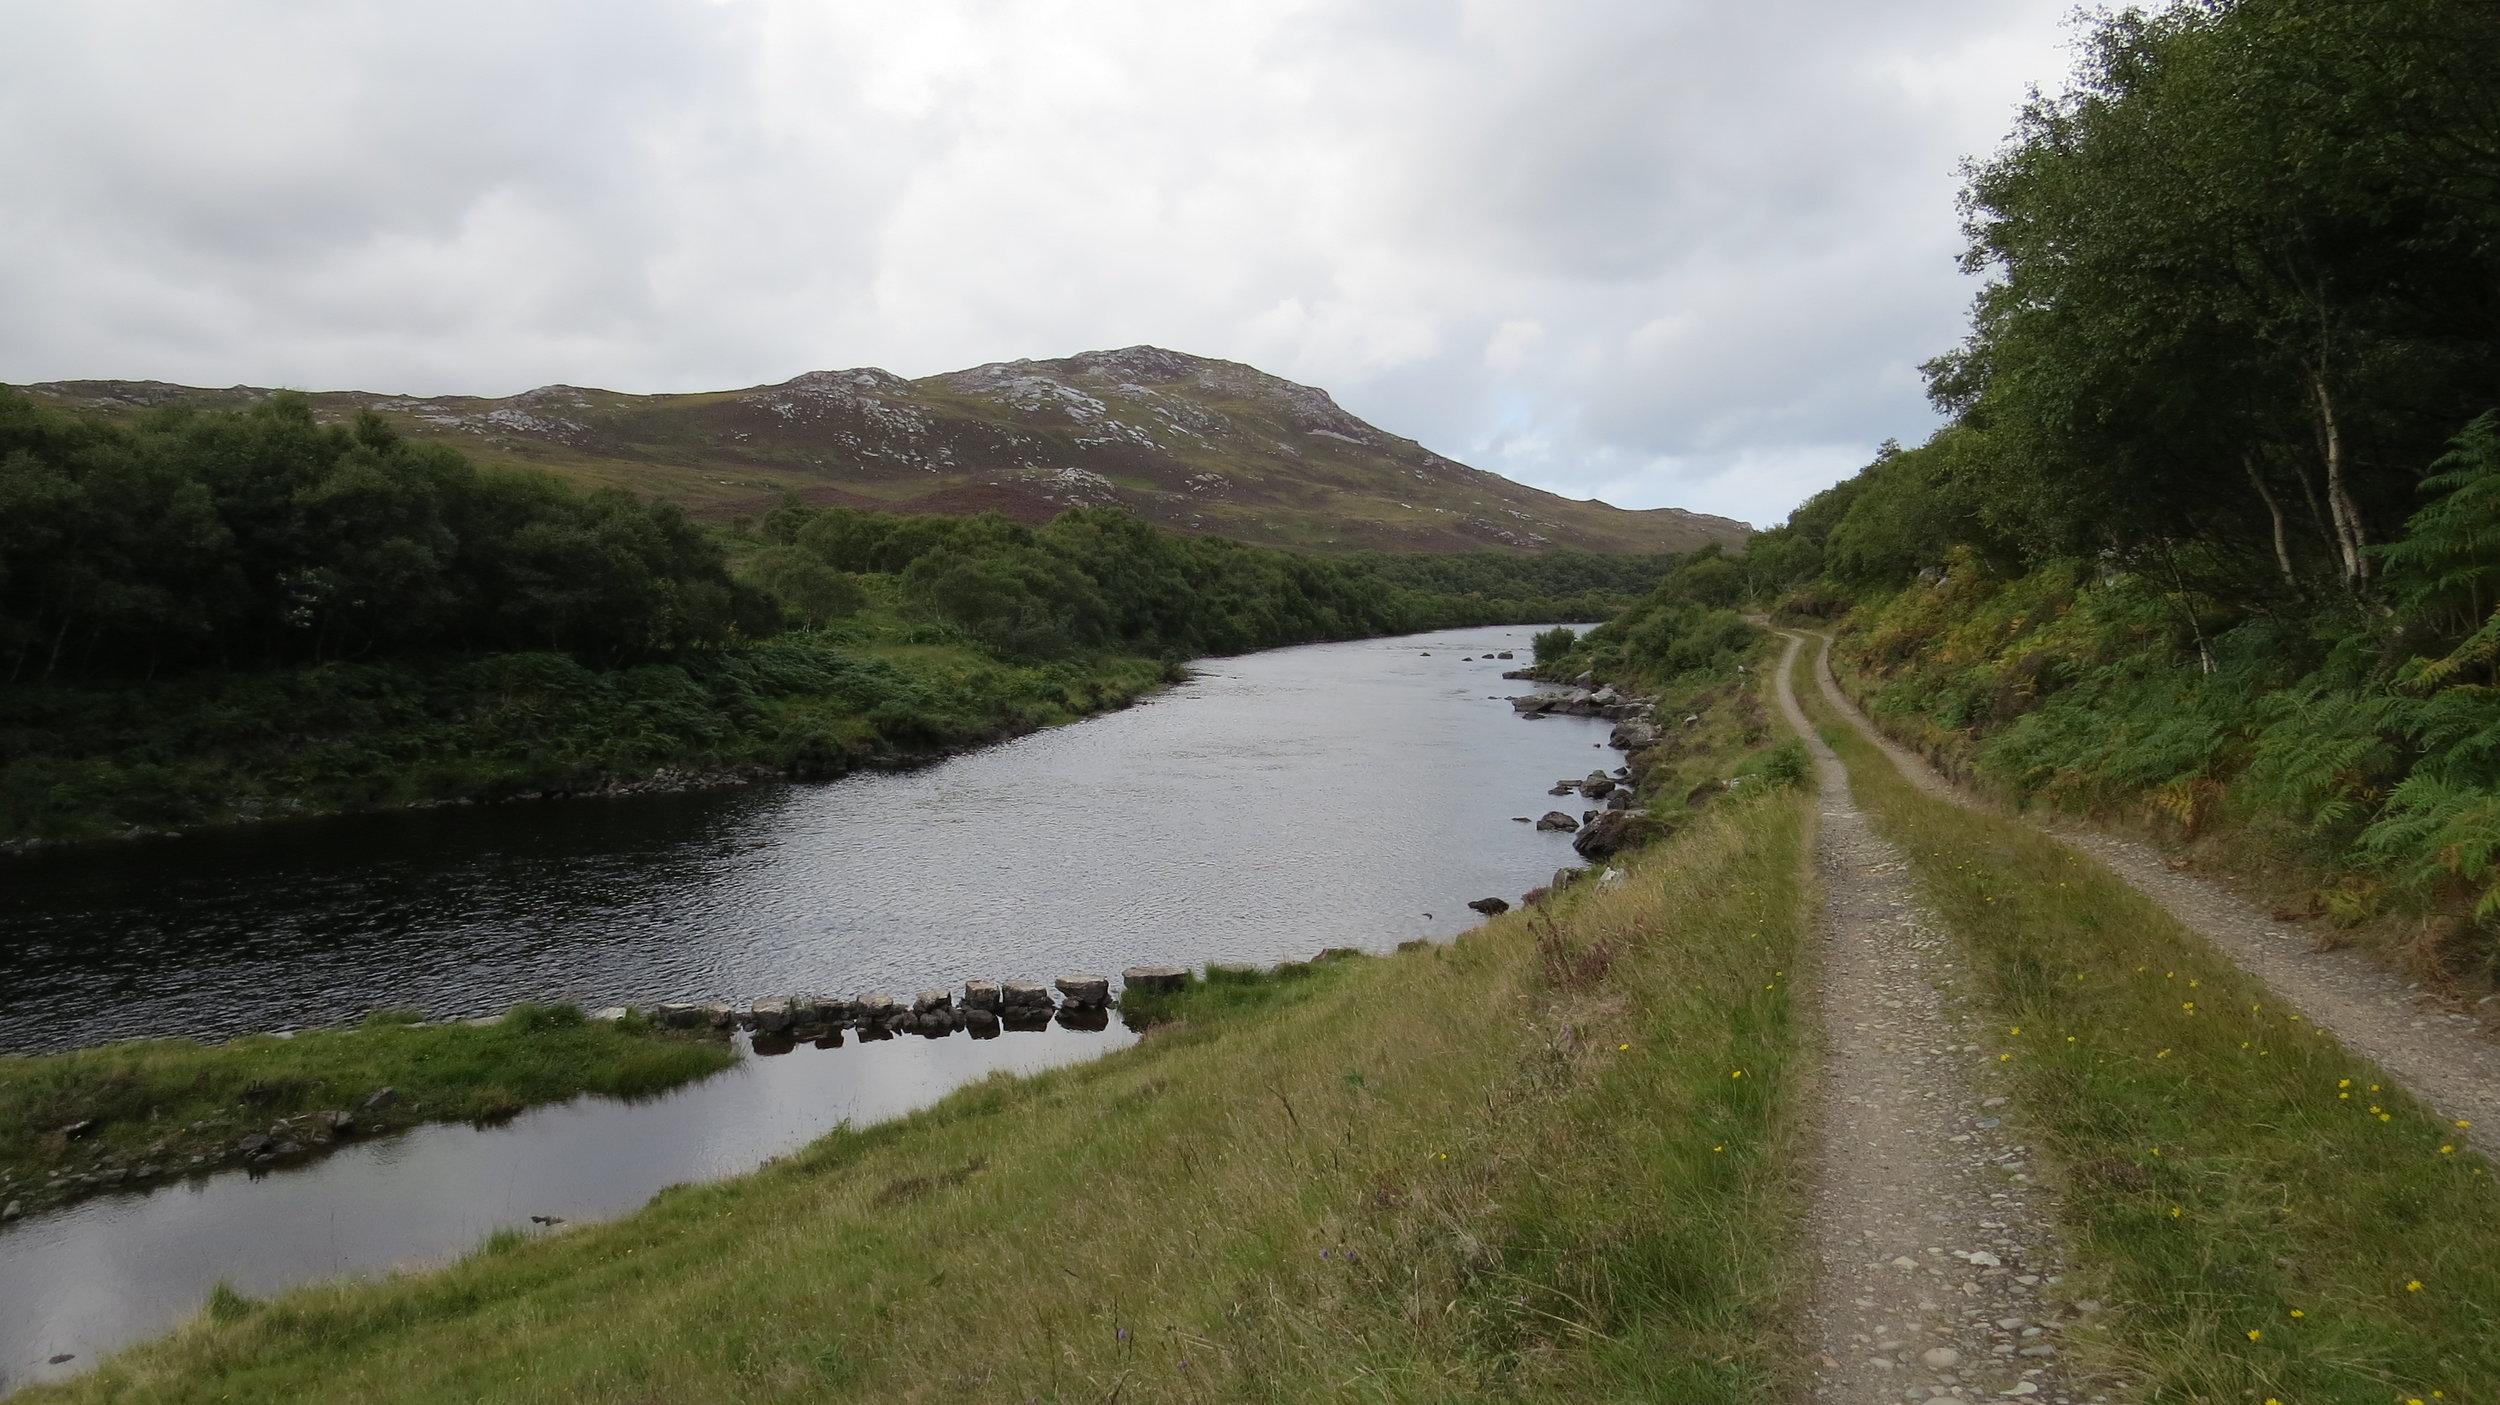 Track from Hope Bridge